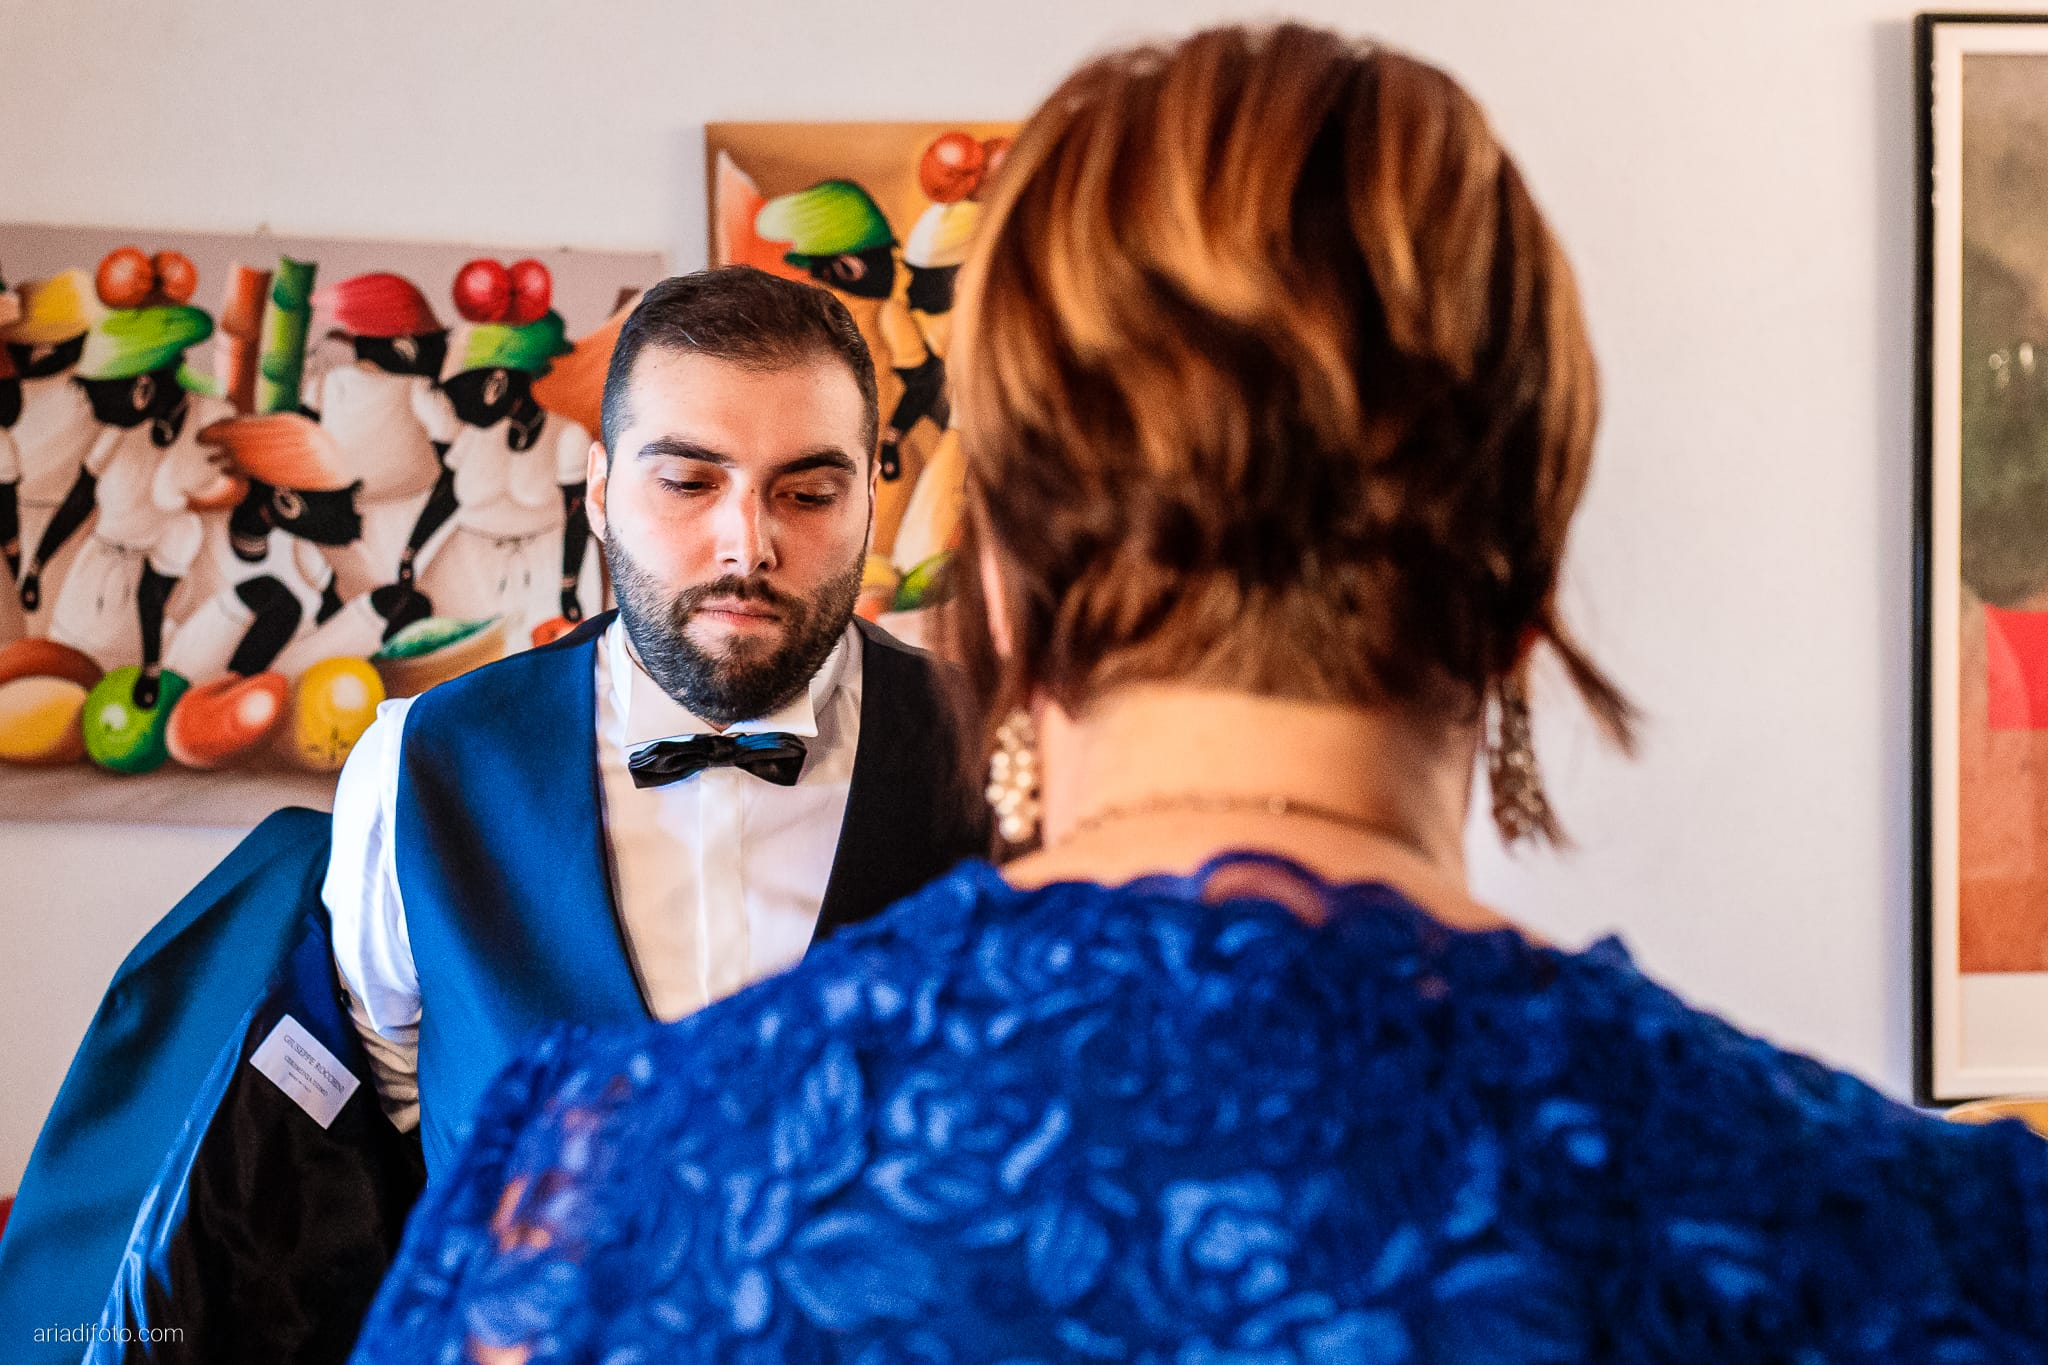 Rosylenia Luca Matrimonio Duino Ristorante Napoleone Castions Udine preparativi sposo